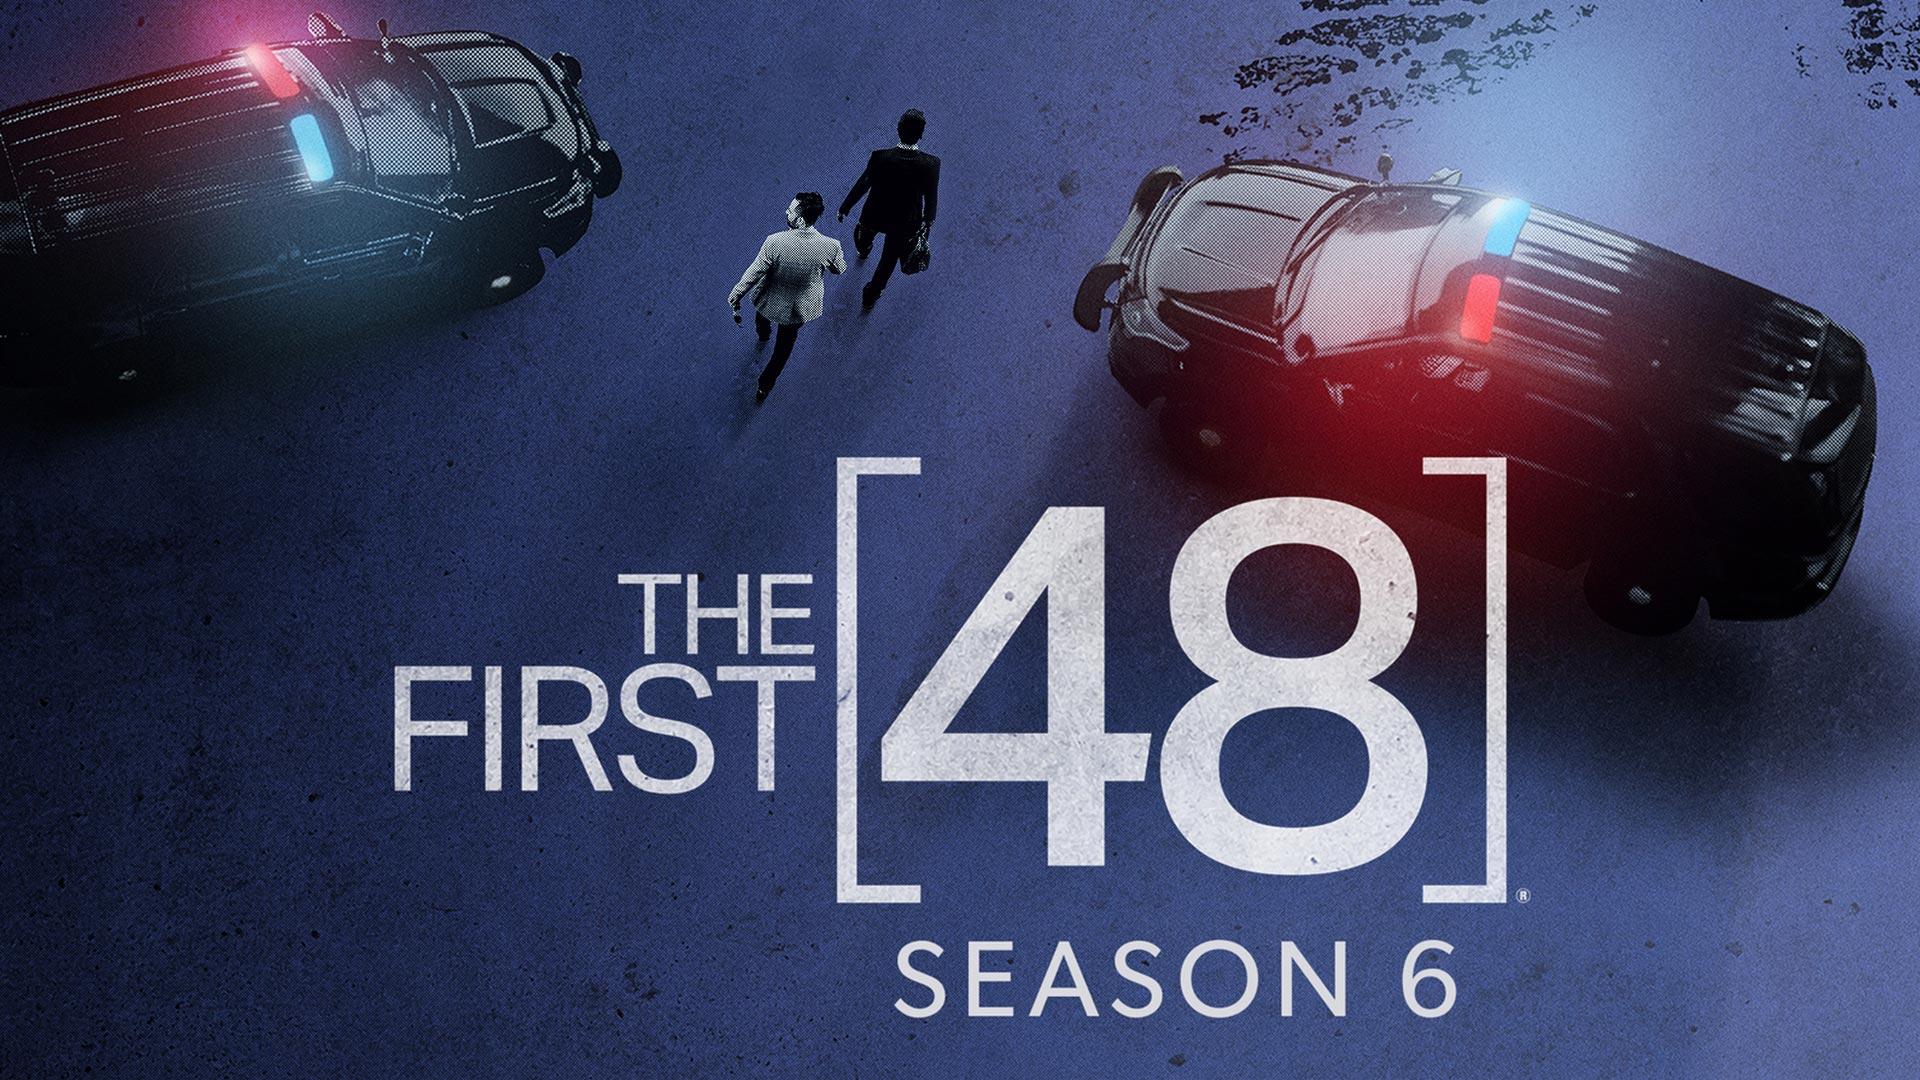 The First 48 - Season 6